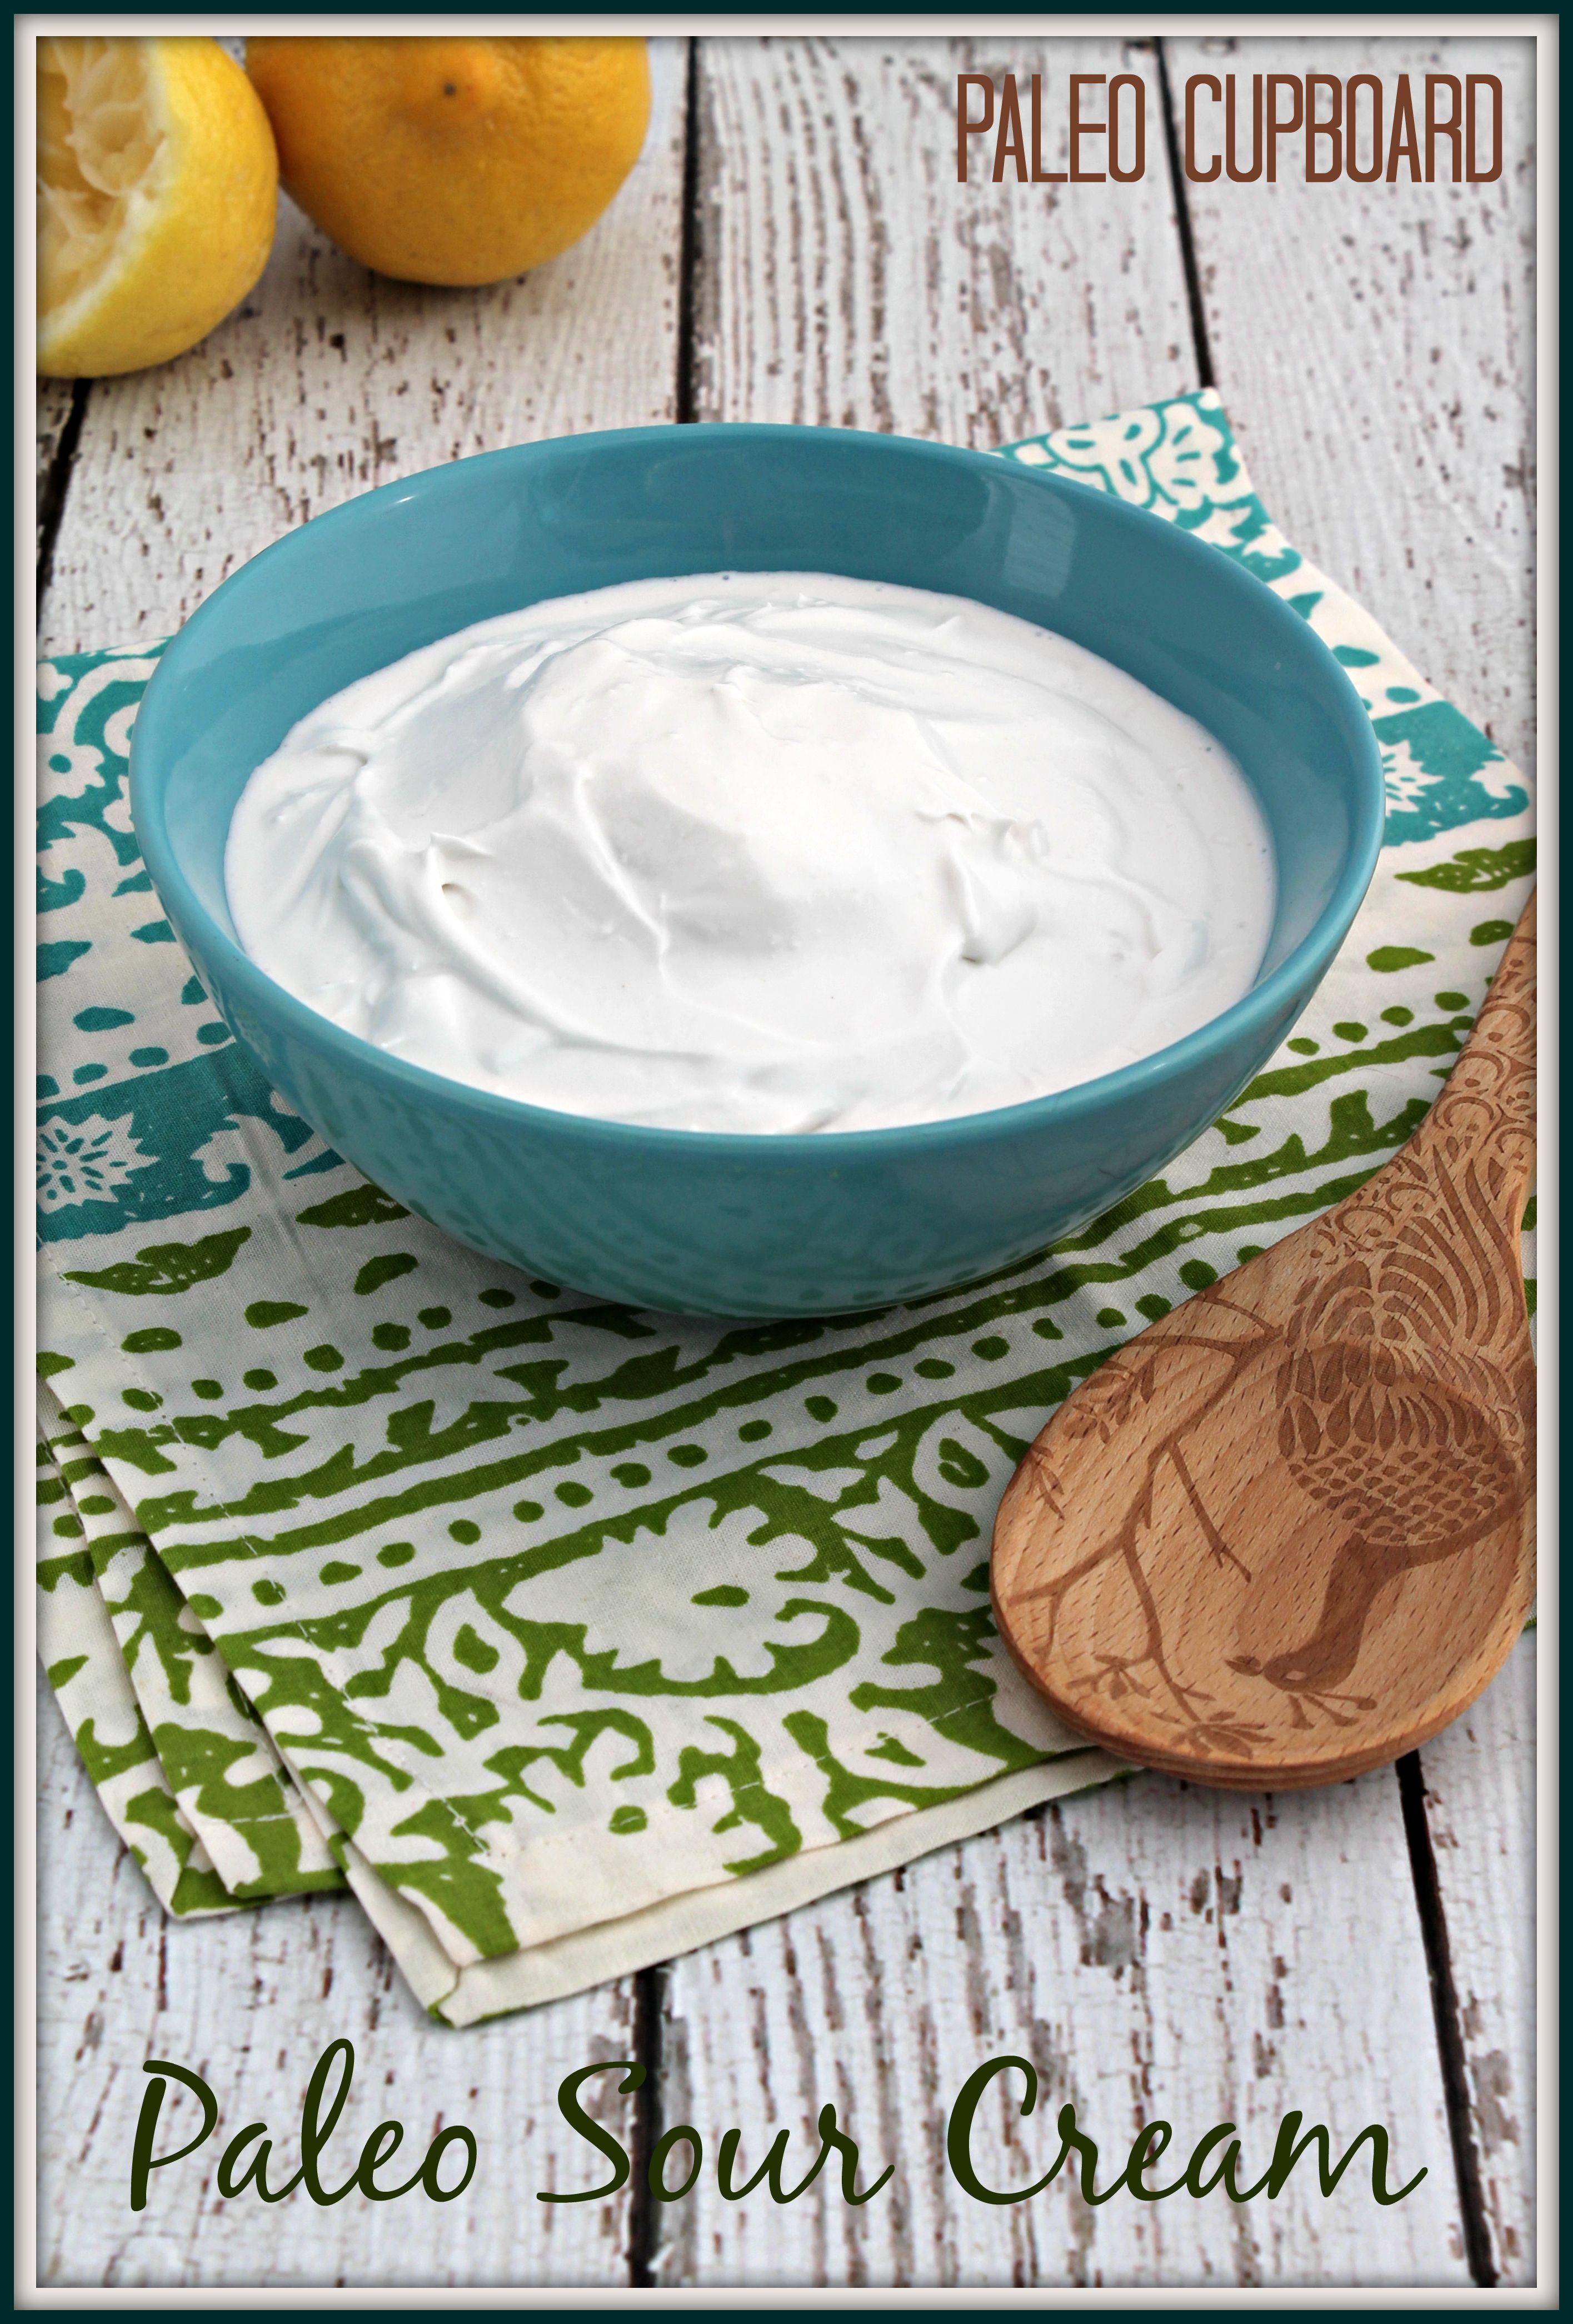 Paleo Sour Cream Recipe -- www.PaleoCupboard.com